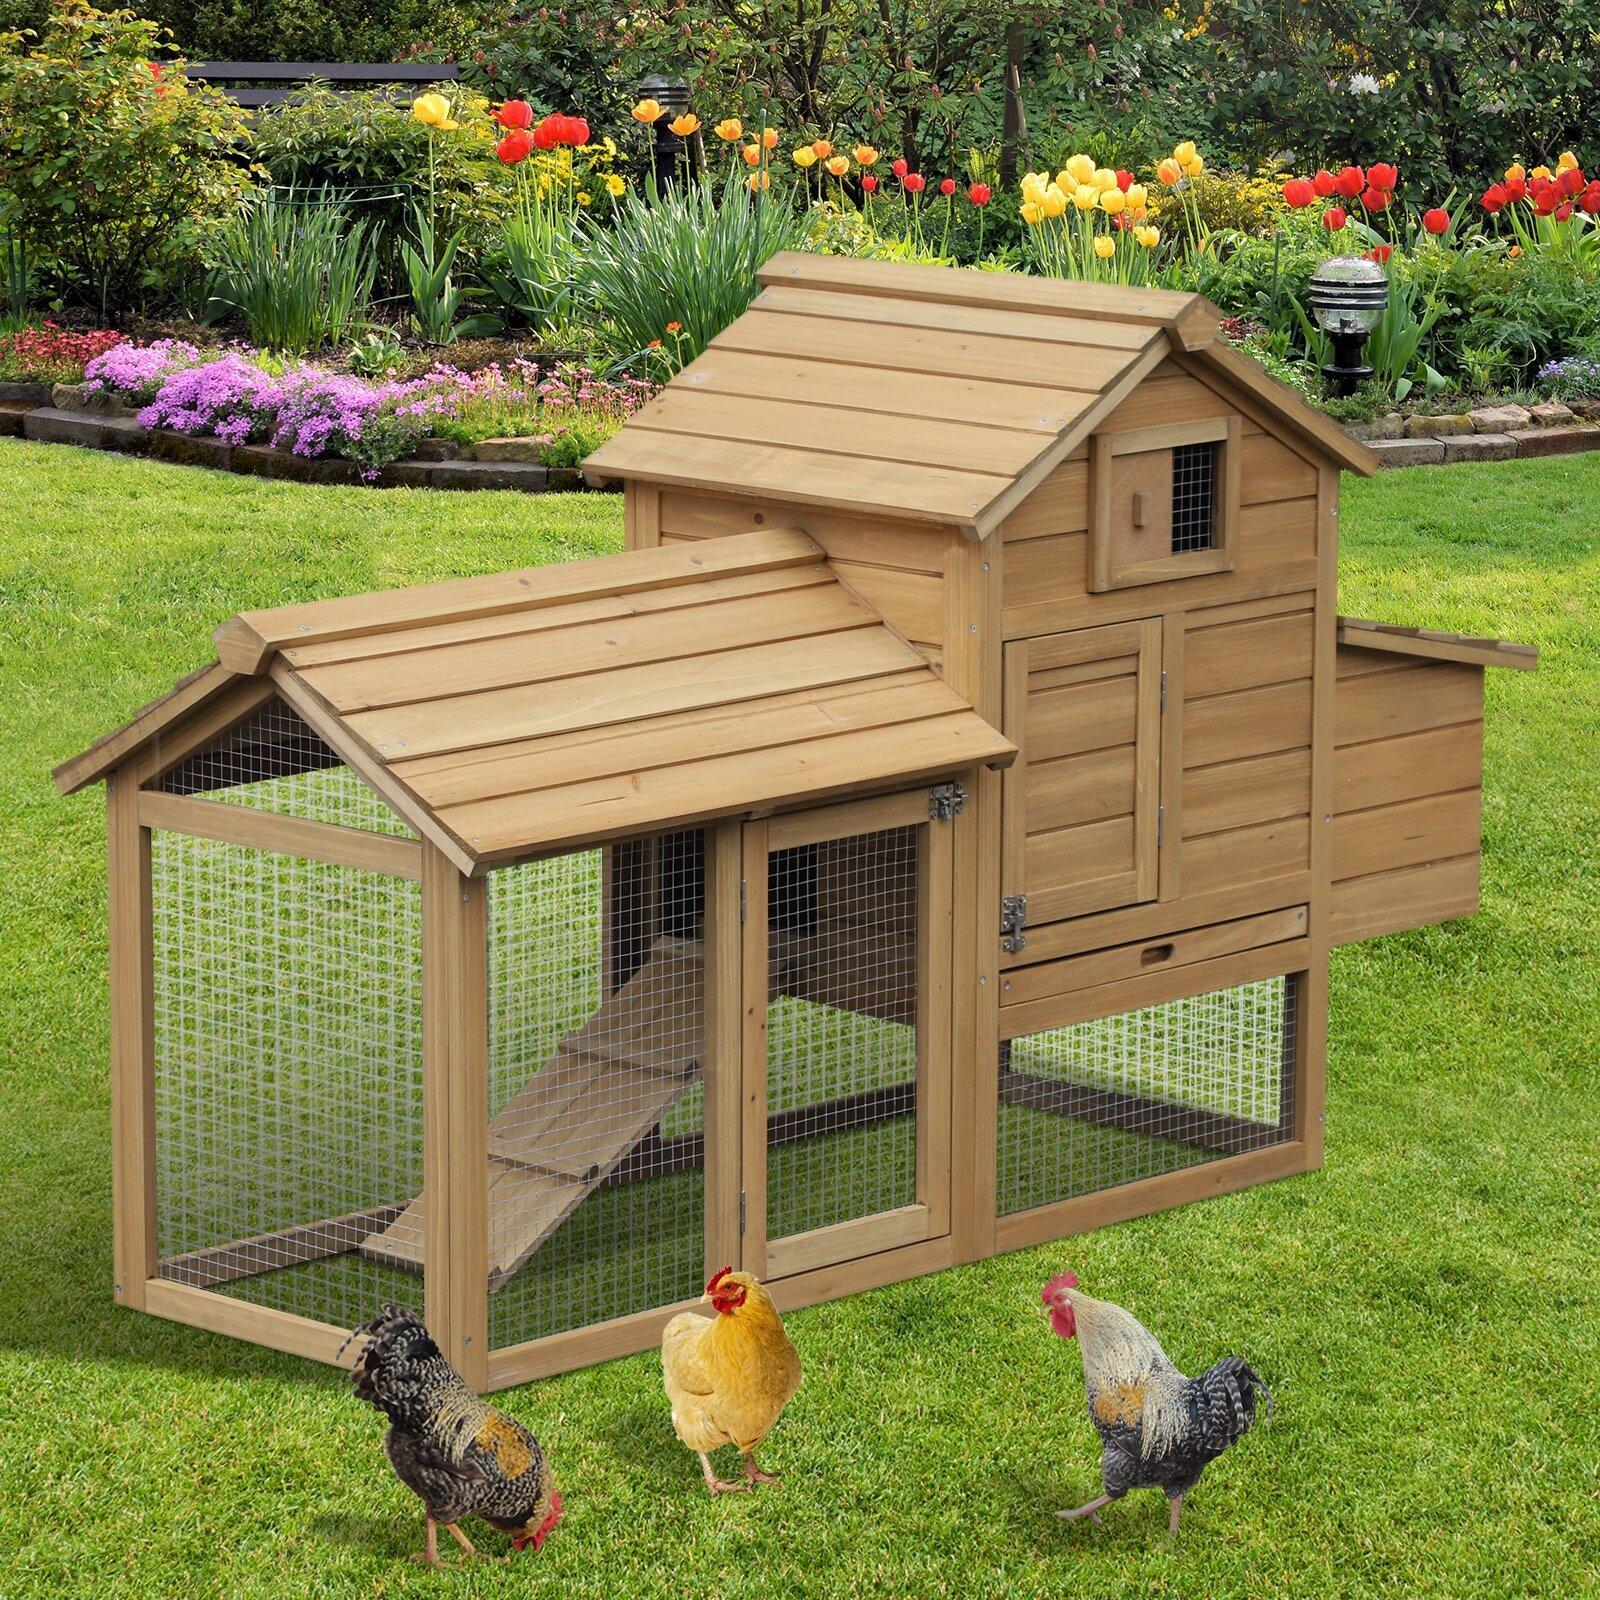 Tucker Murphy Pet Calzada Chicken Coop With Chicken Run For Up To